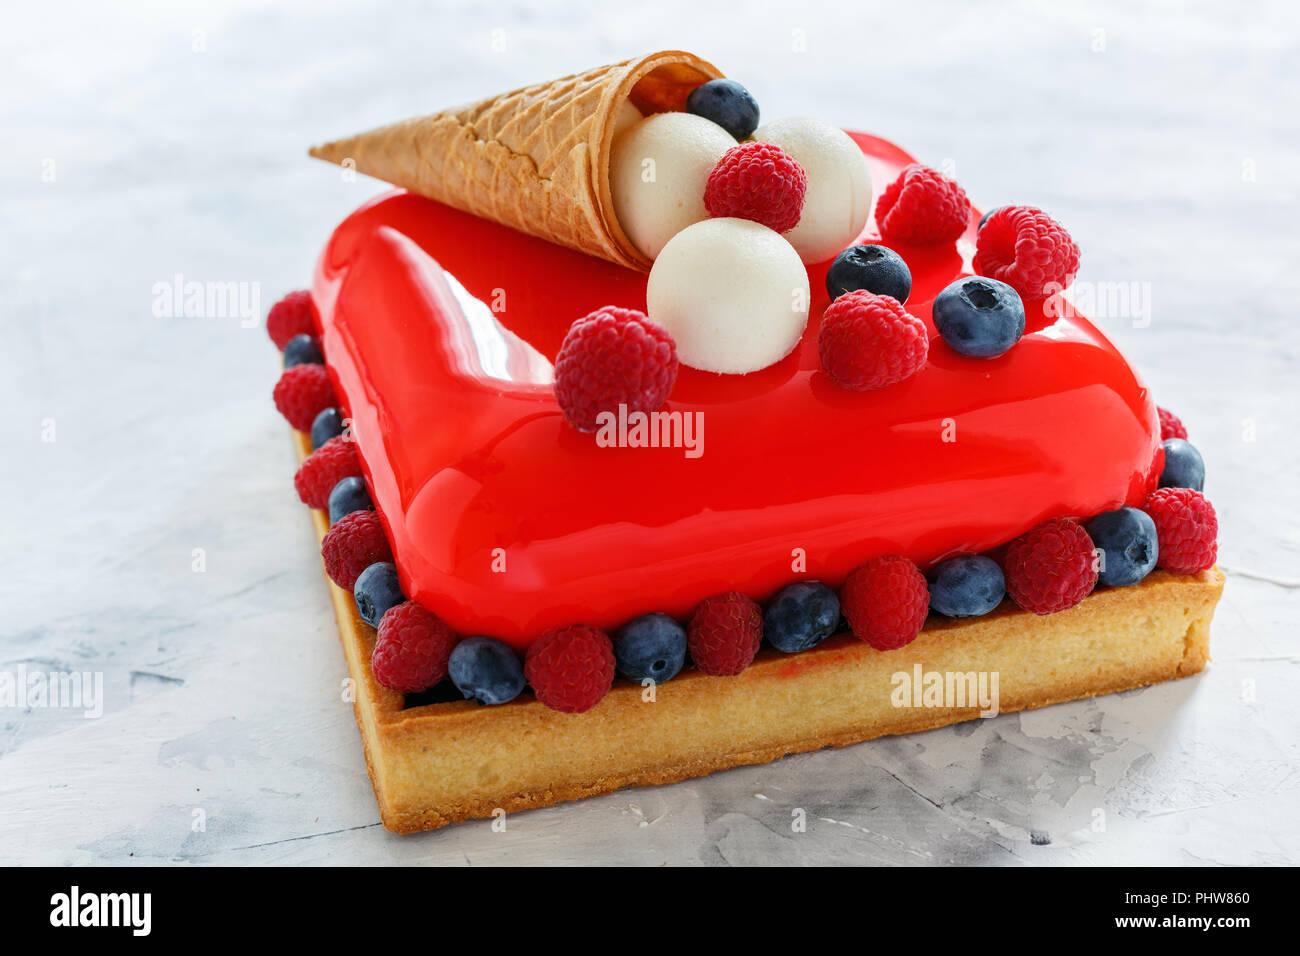 Moderne Mousse Cake Mit Roter Glasur Stockfoto Bild 217528808 Alamy